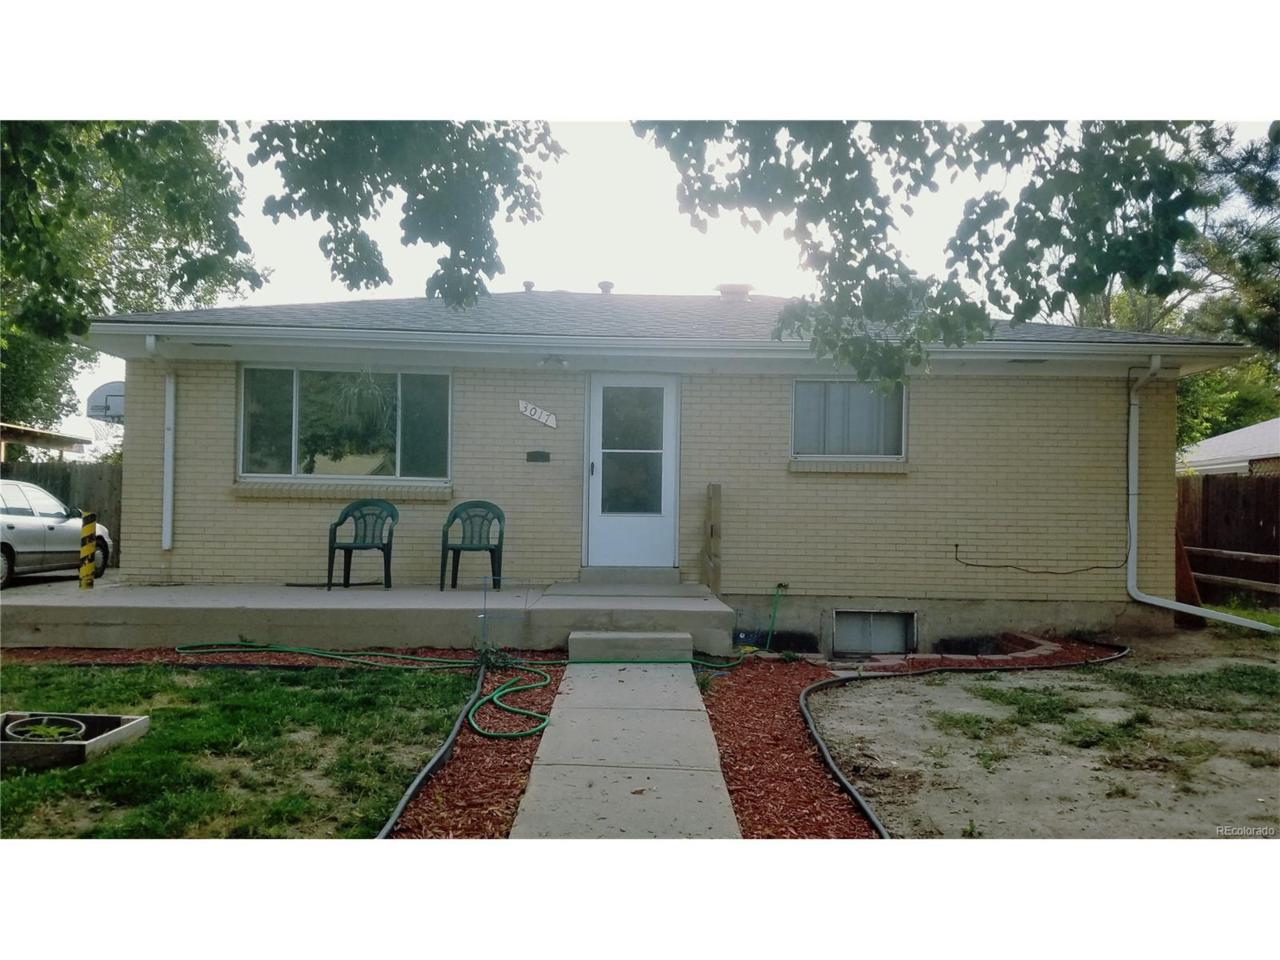 3017 Cimarron Street, Aurora, CO 80011 (MLS #7955755) :: 8z Real Estate